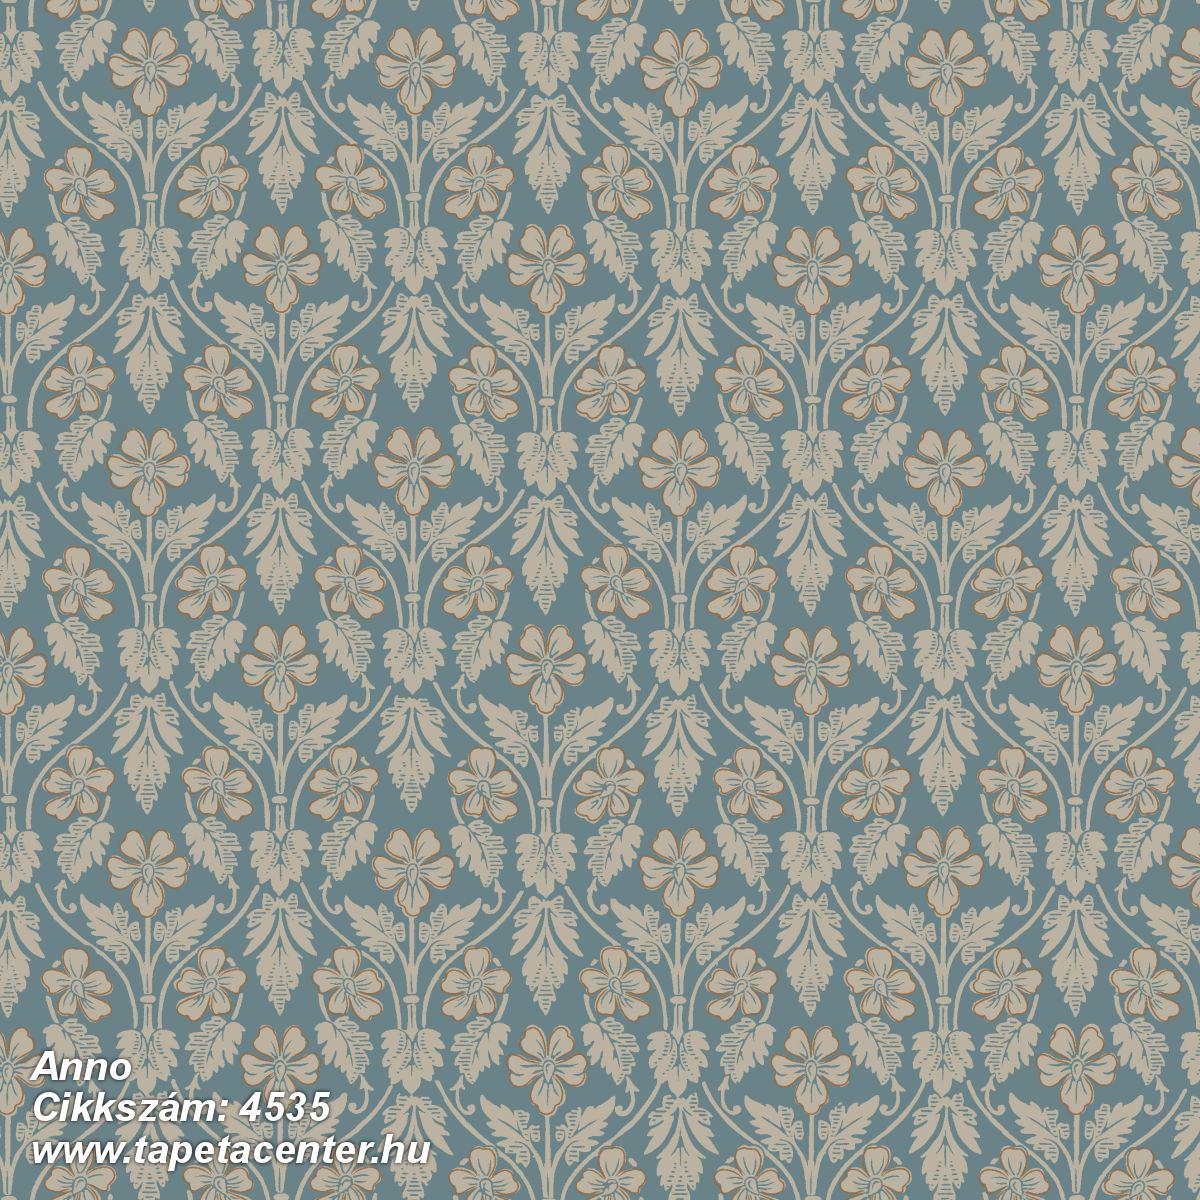 Barokk-klasszikus,barokk-klasszikus,bronz,kék,szürke,lemosható,vlies tapéta